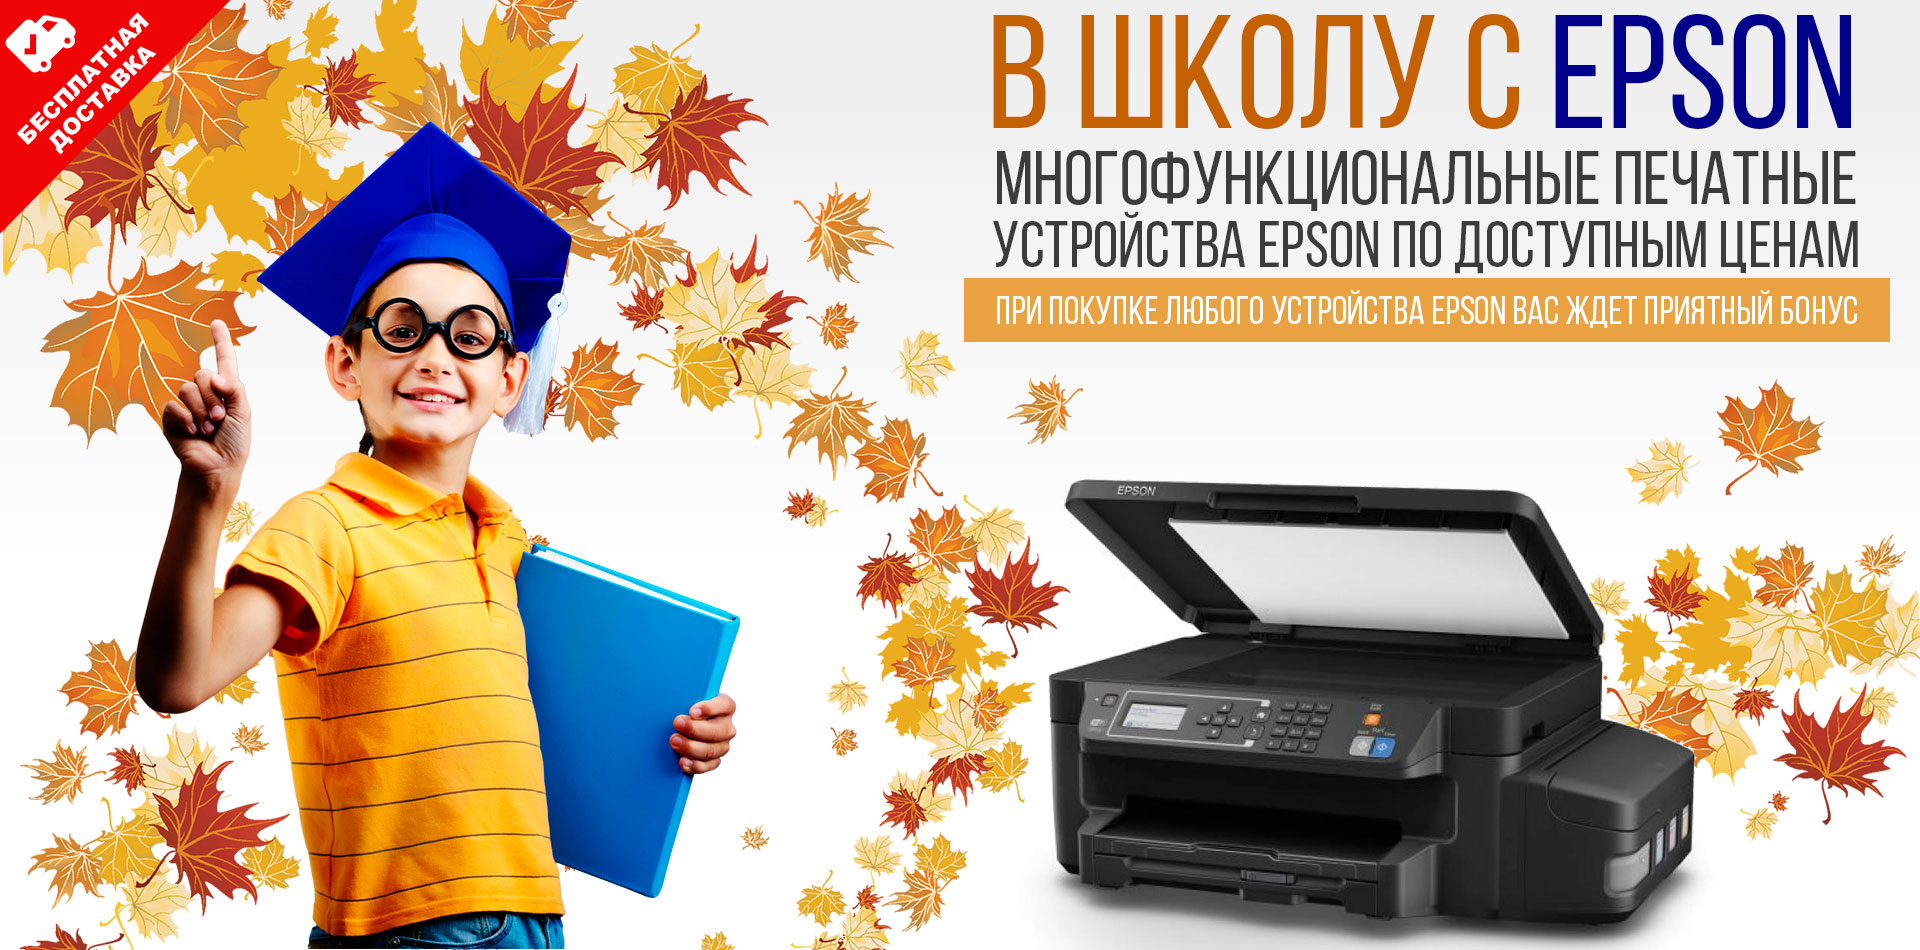 МФУ EPSON В АСТАНЕ.